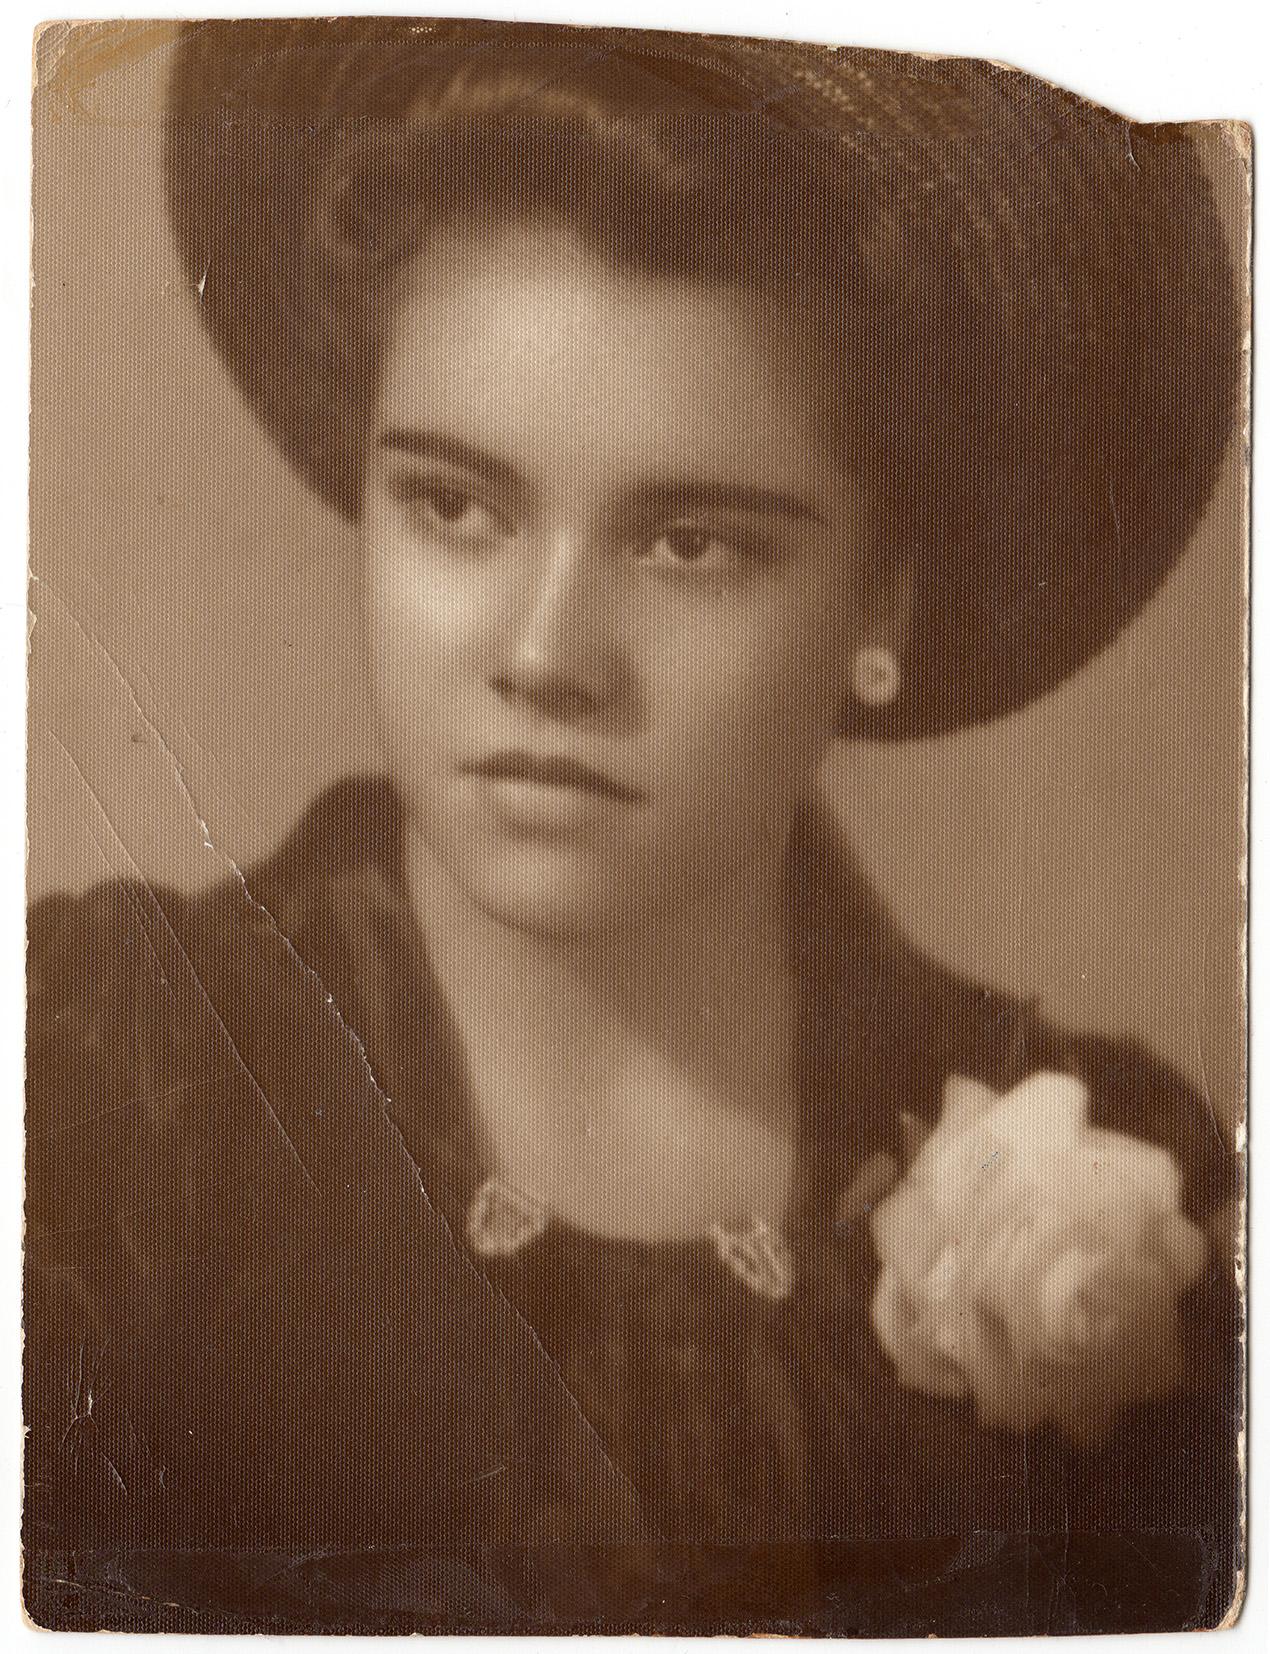 Susana Dominguez, Oscar's grandmother, who wrote the song, Te Quiero Tanto.